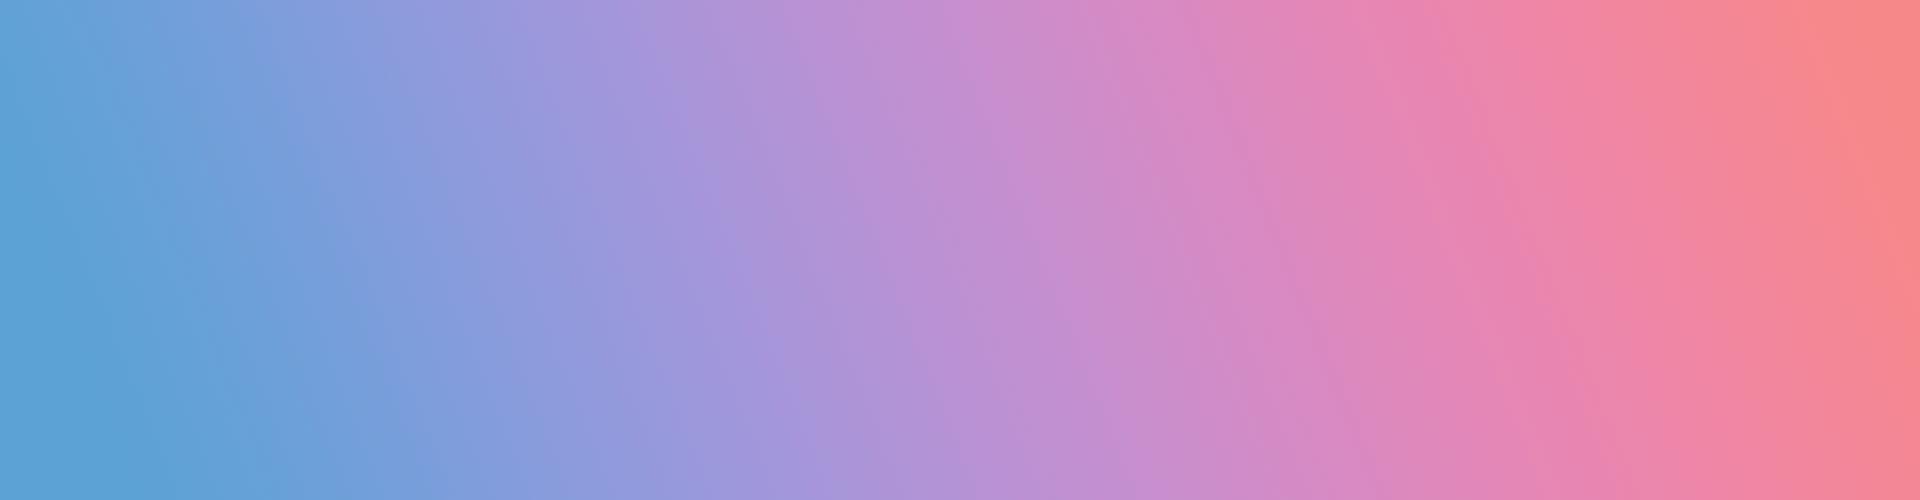 VIDA gradient blue to pink